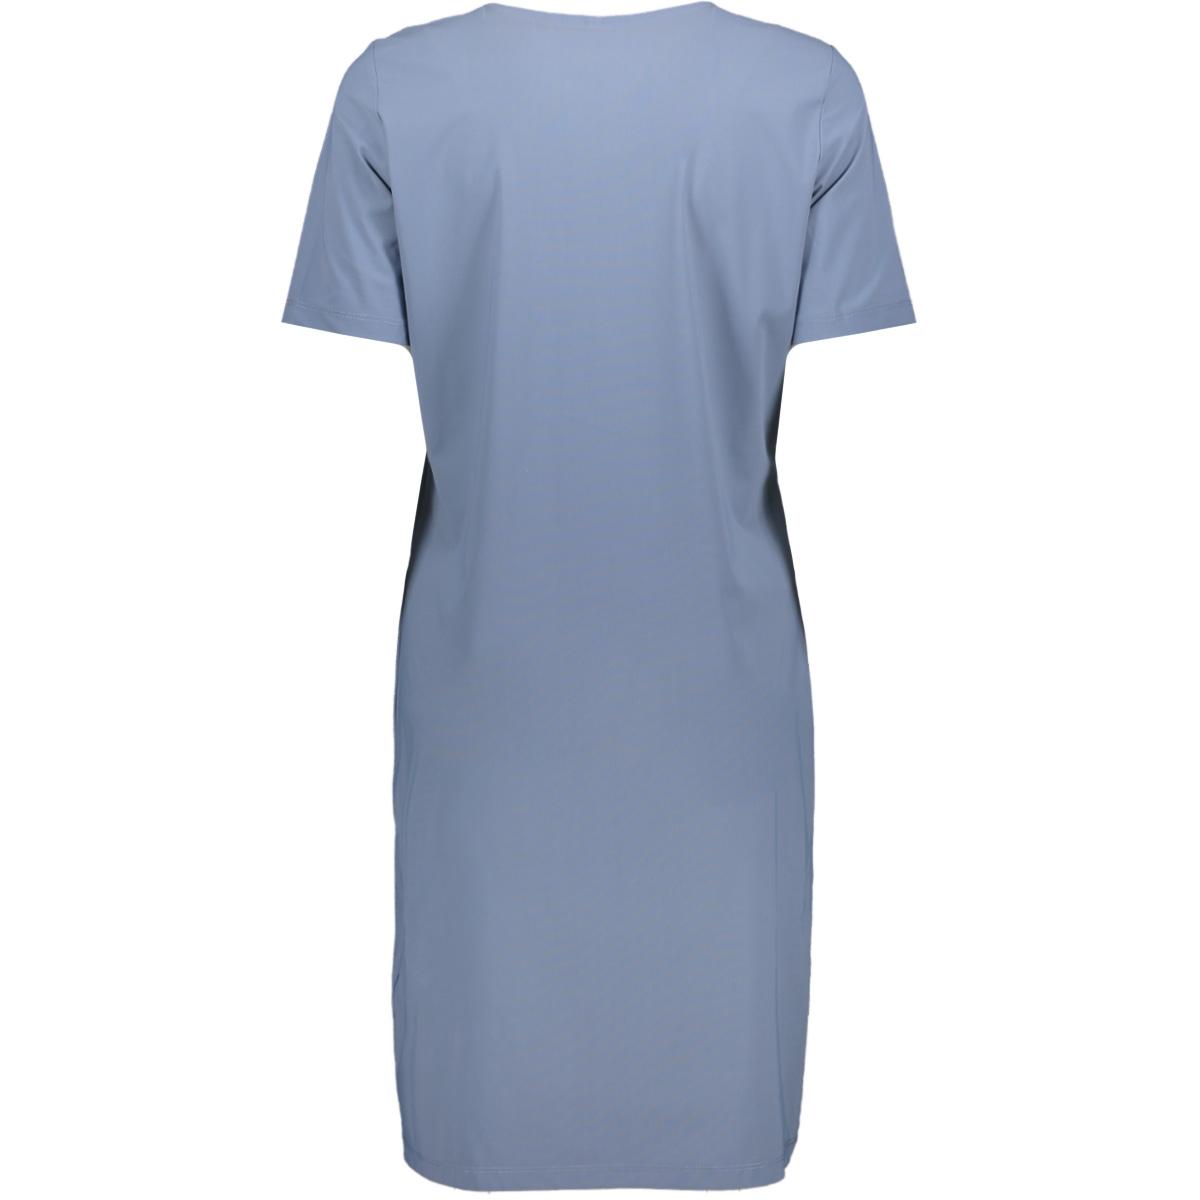 erica travel v neck dress 202 zoso jurk blue